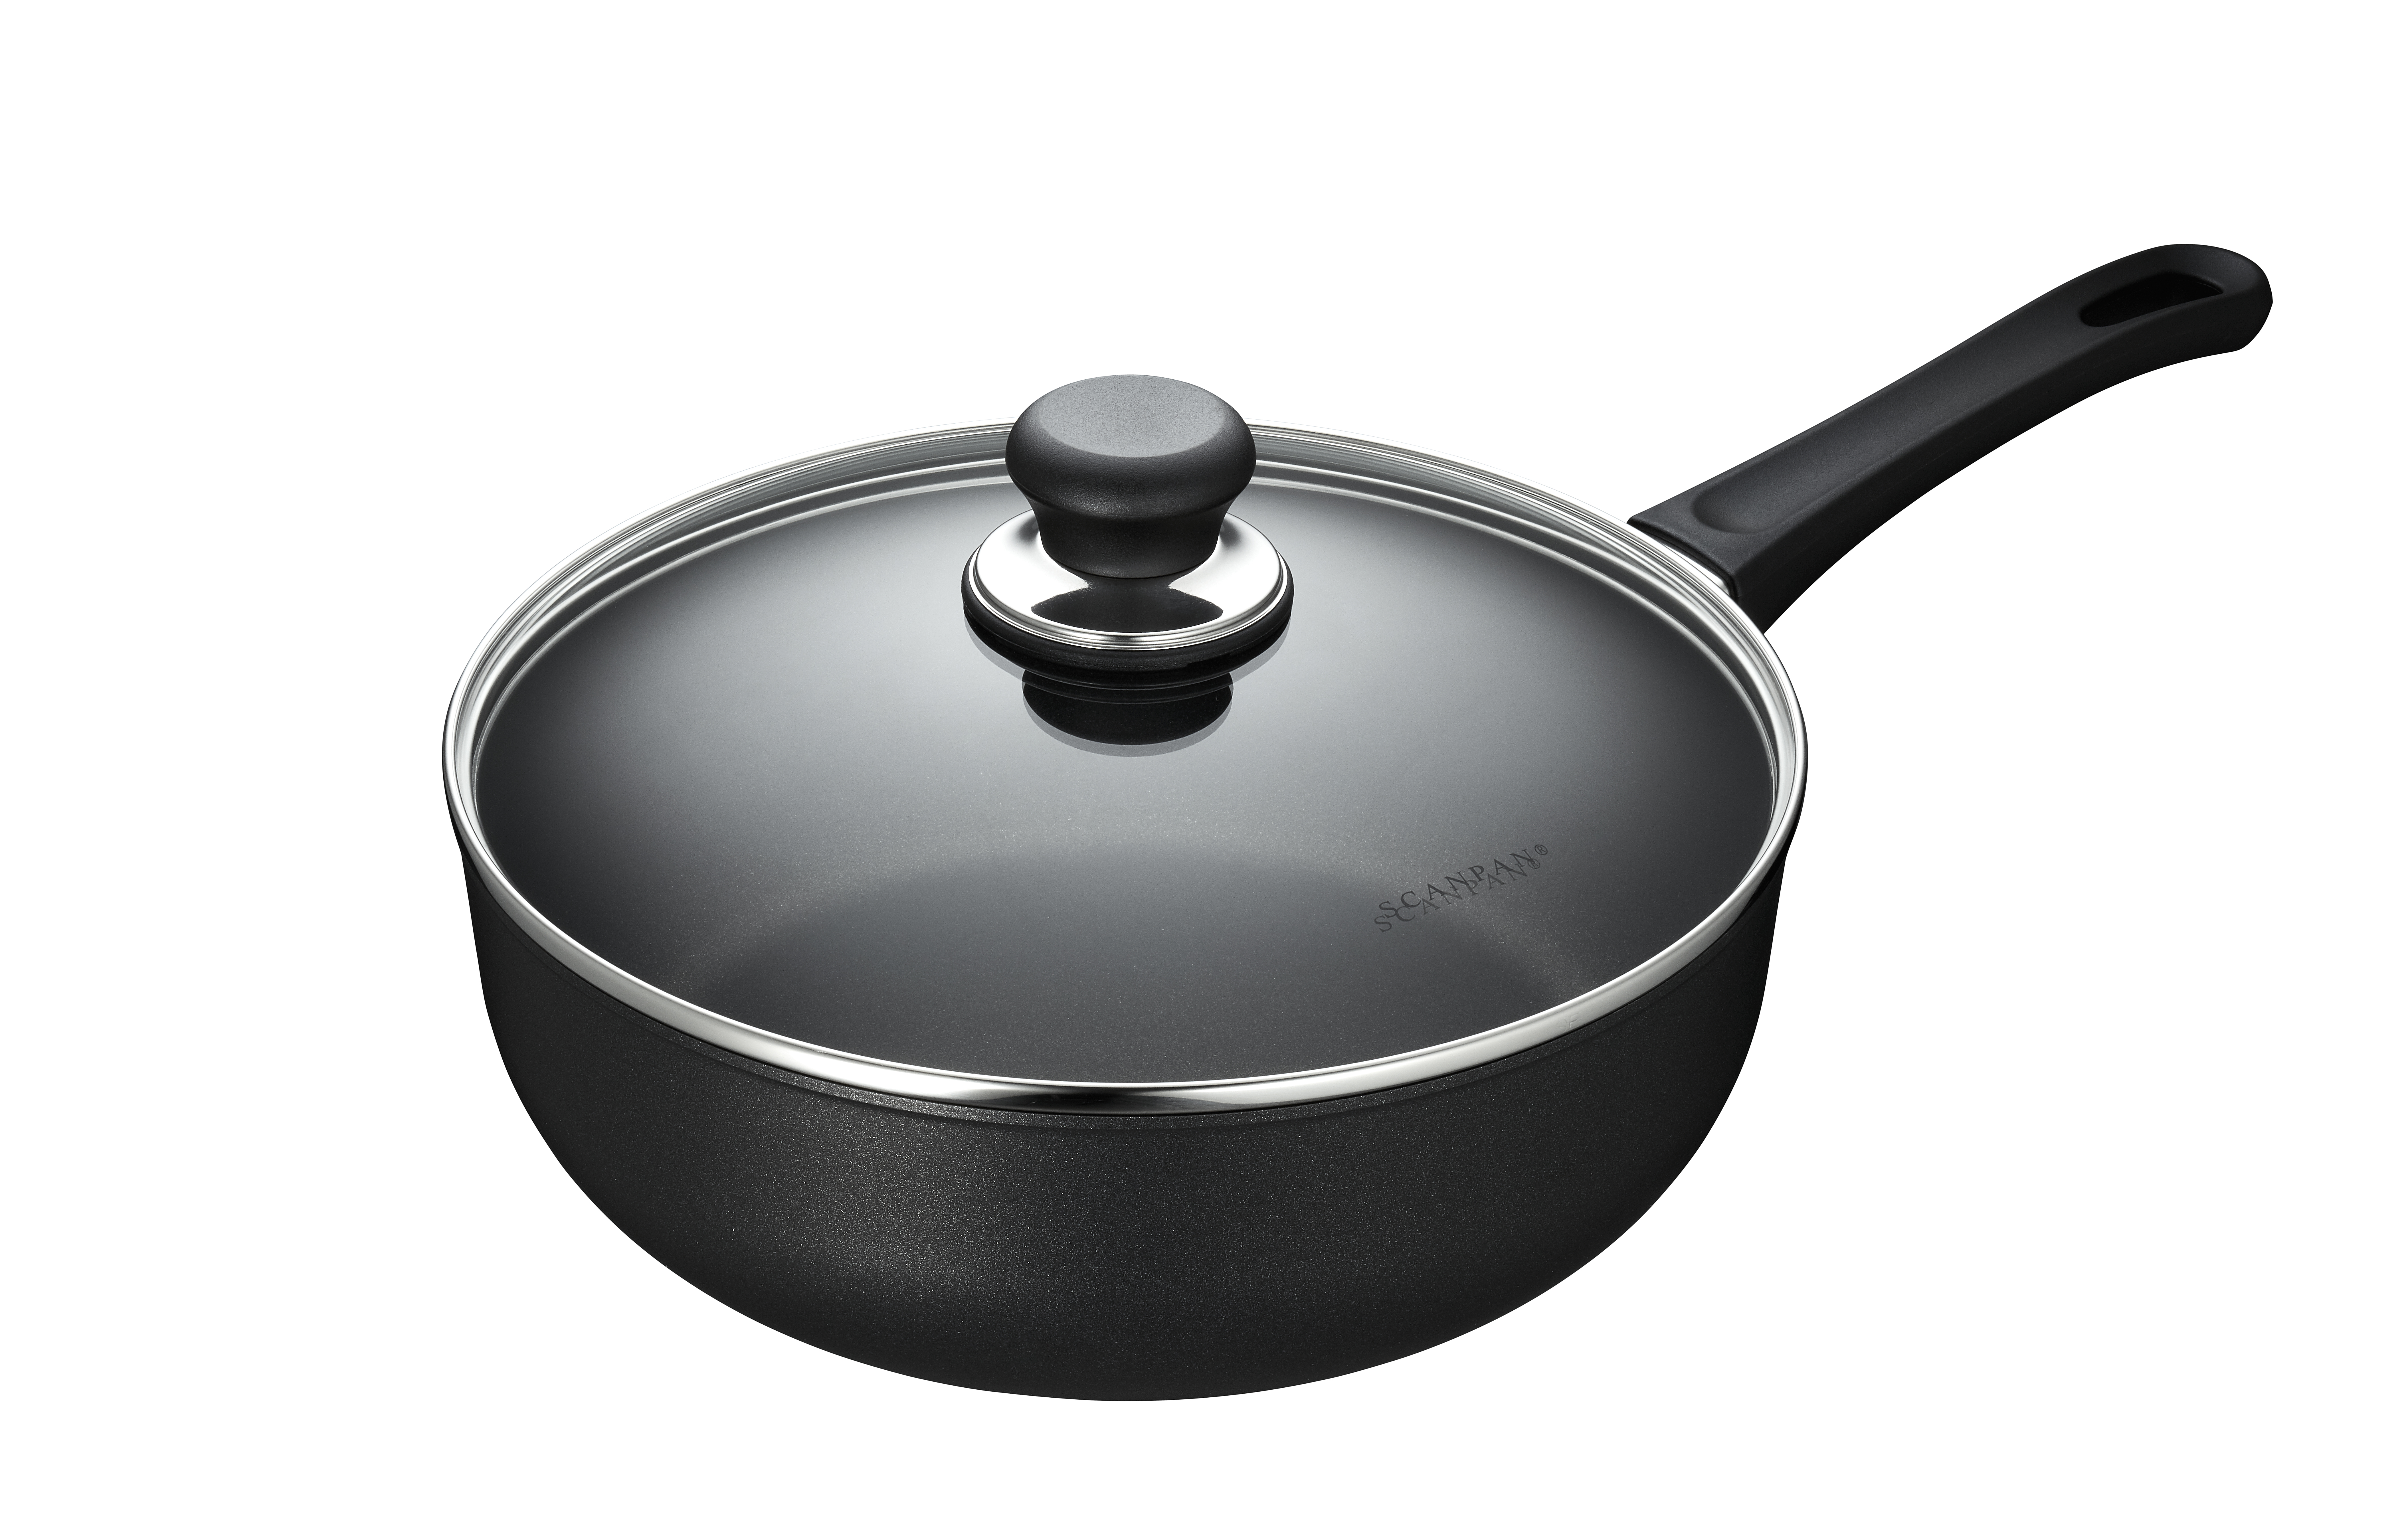 3.7L/4qtCov. Deep Sauté Pan - Classic, 3.7L 26cm